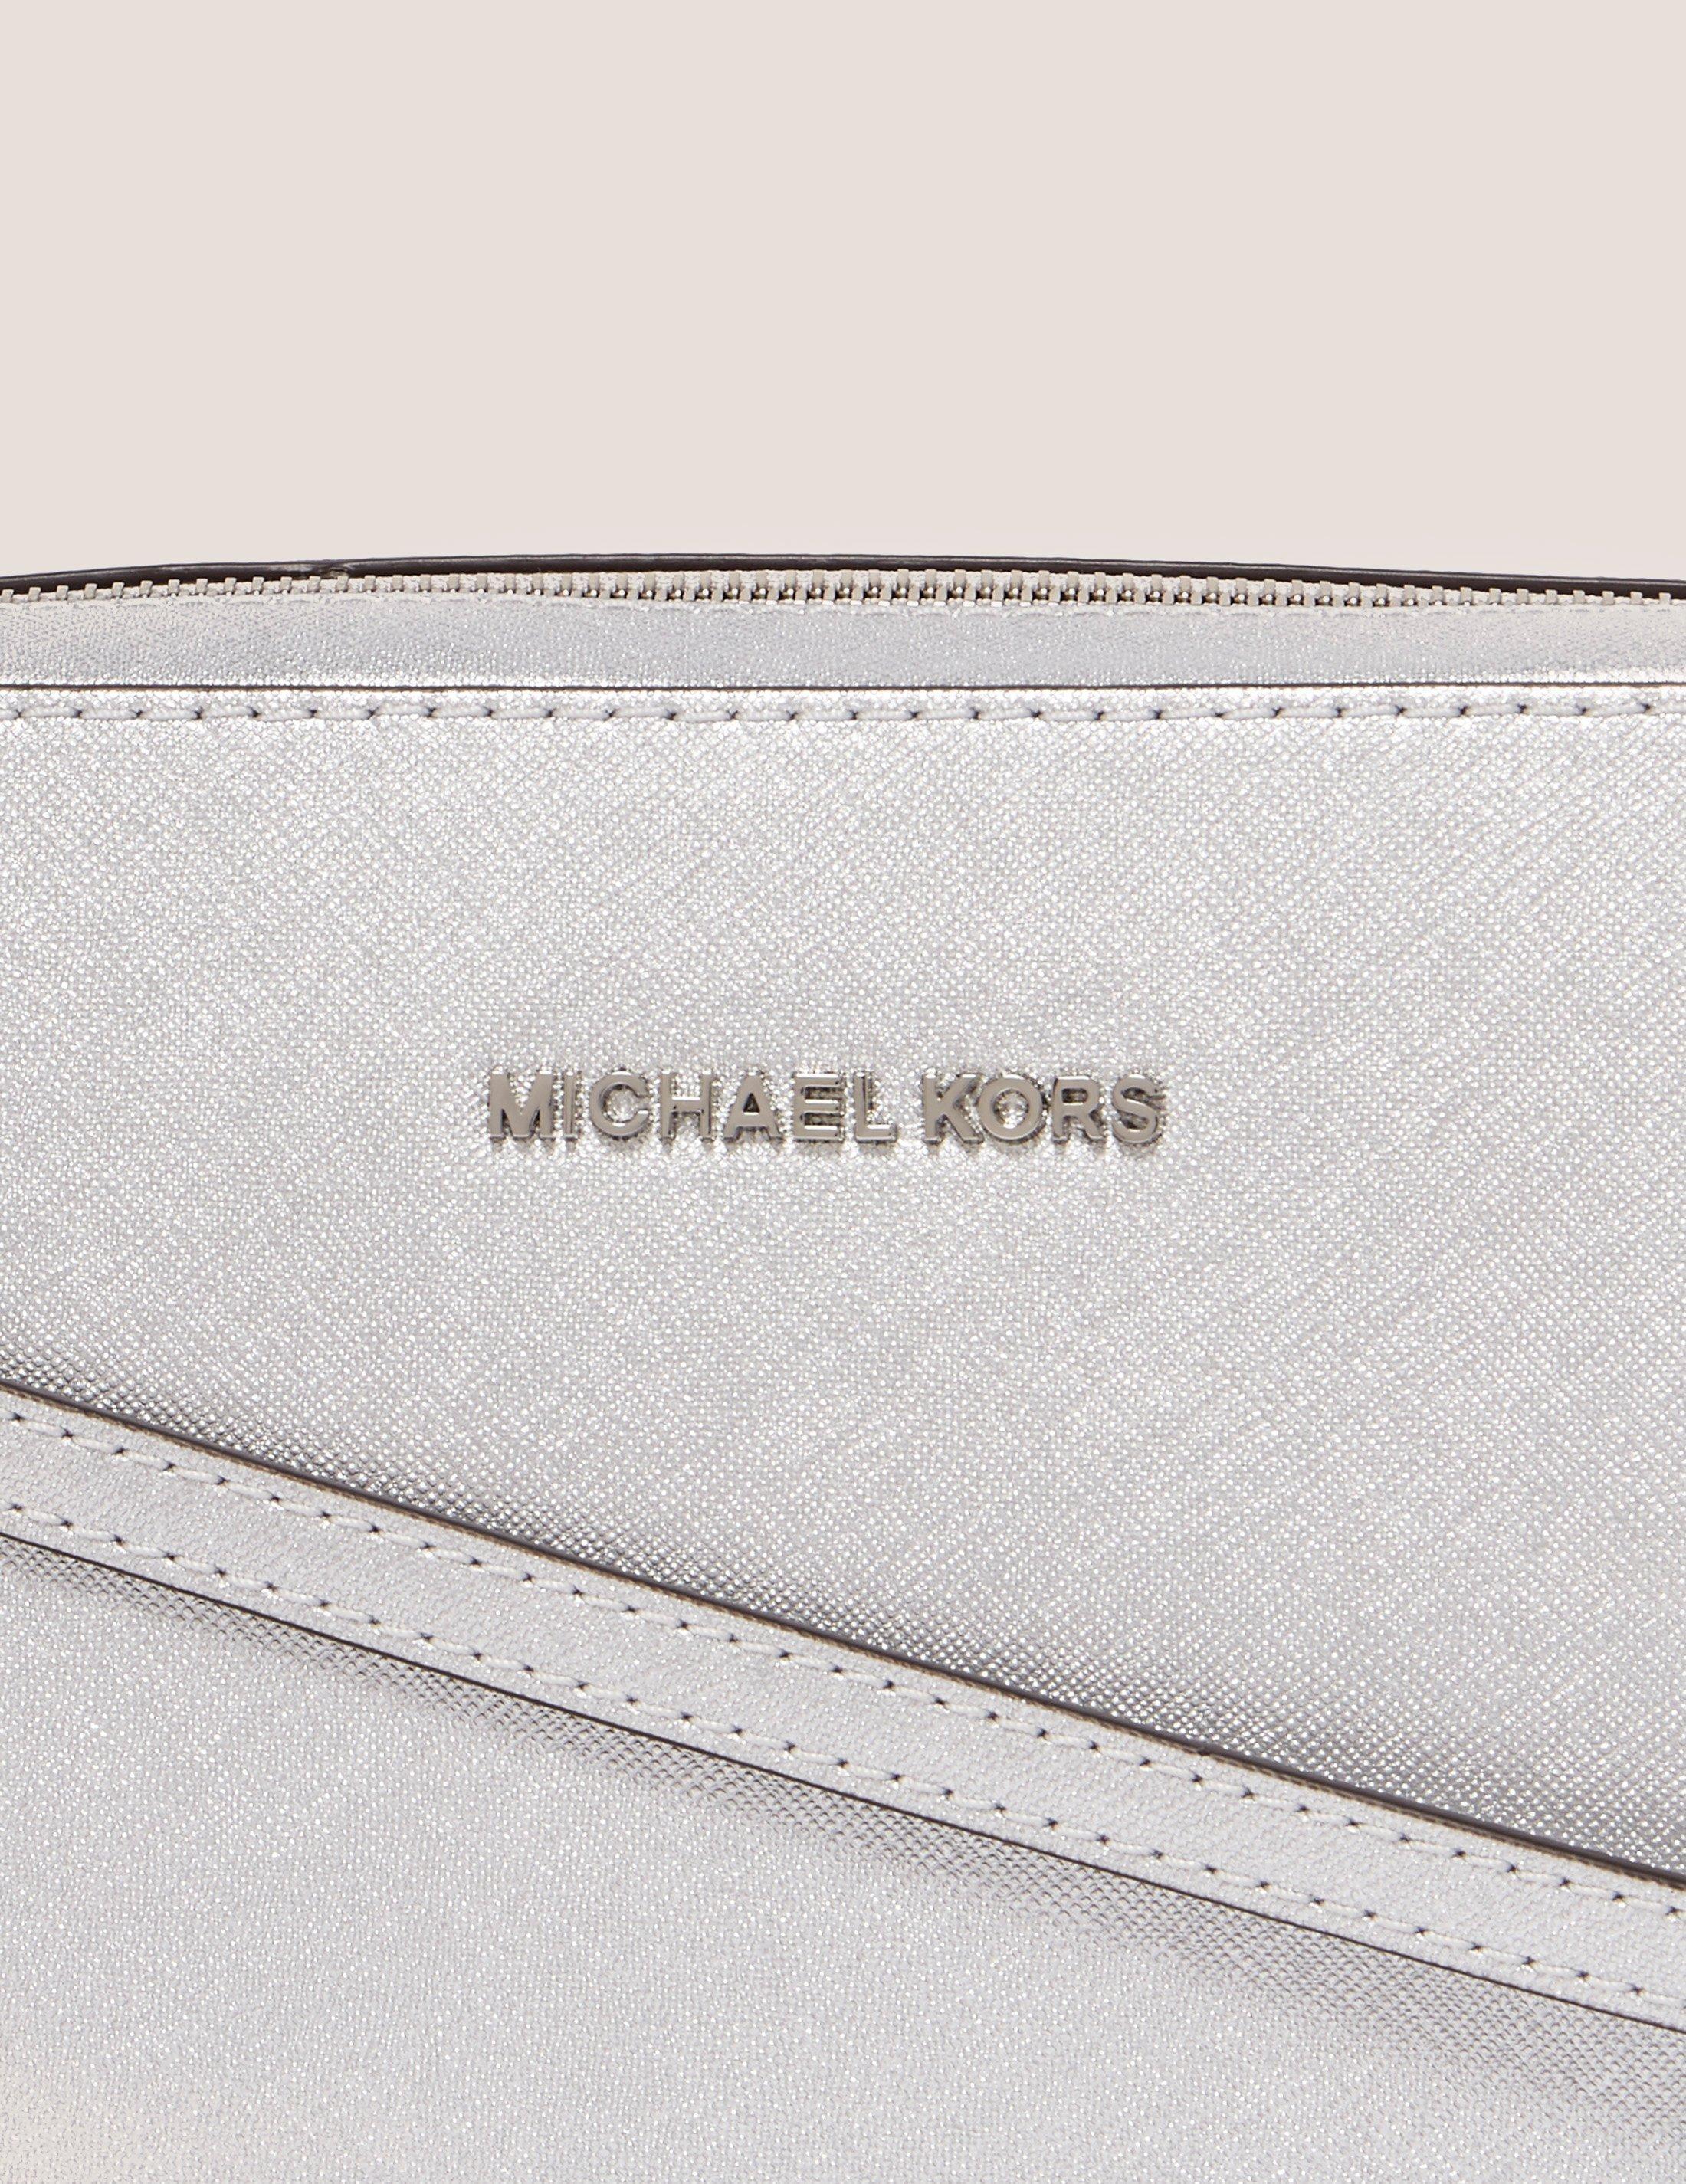 Michael Kors Leather Jet Set Large Crossbody Bag Silver in Metallic